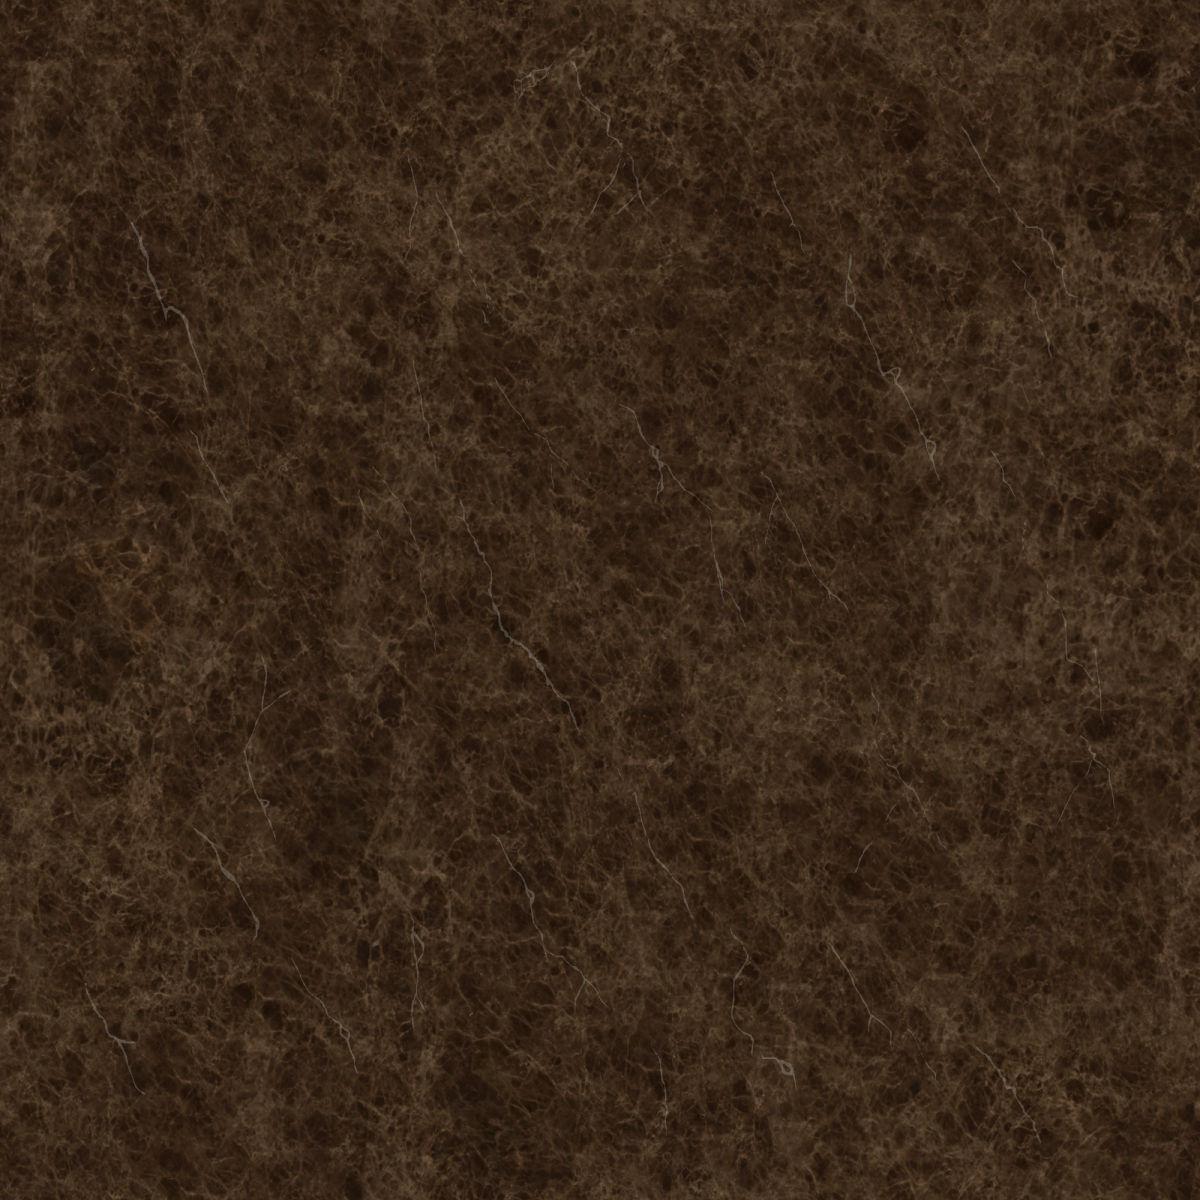 Natural Dark Brown Hair To Light Brown